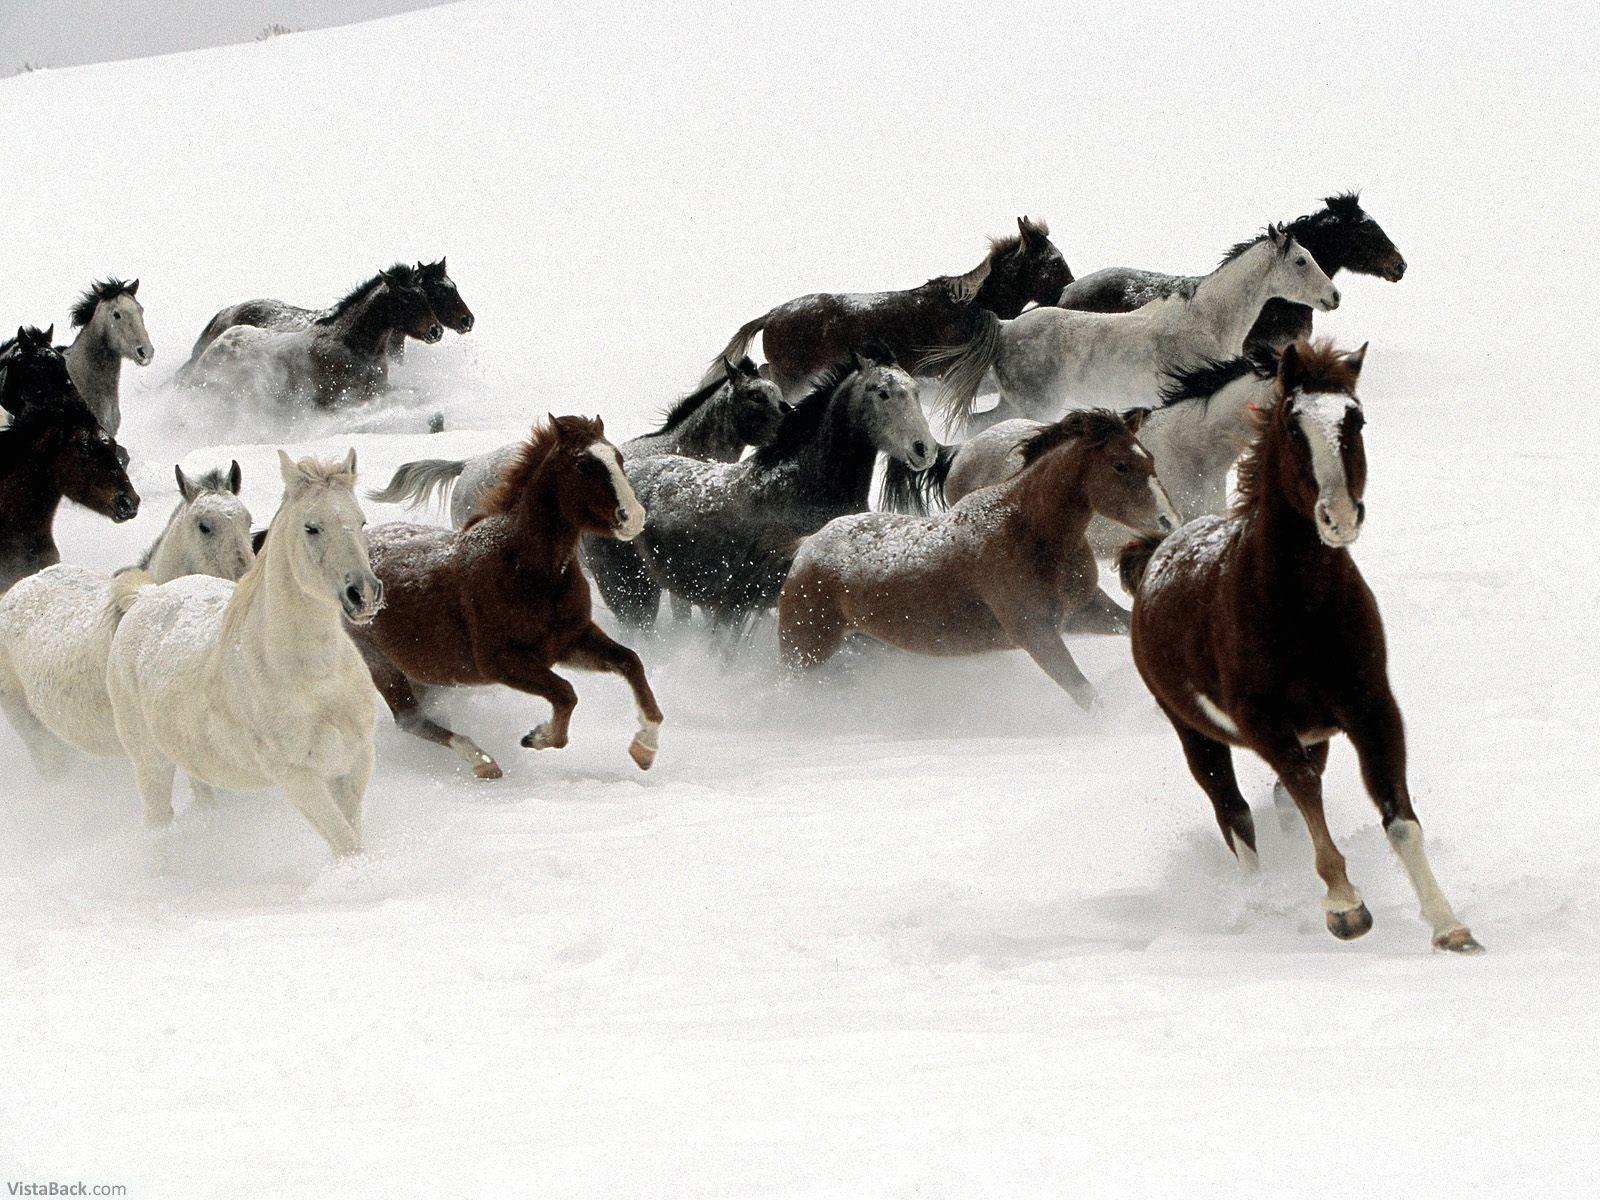 http://2.bp.blogspot.com/_9JS1XqG9_G8/SwMCz4MRUdI/AAAAAAAAAEg/MJcfYxaUKFQ/s1600/3996_Snow_Horses.jpg